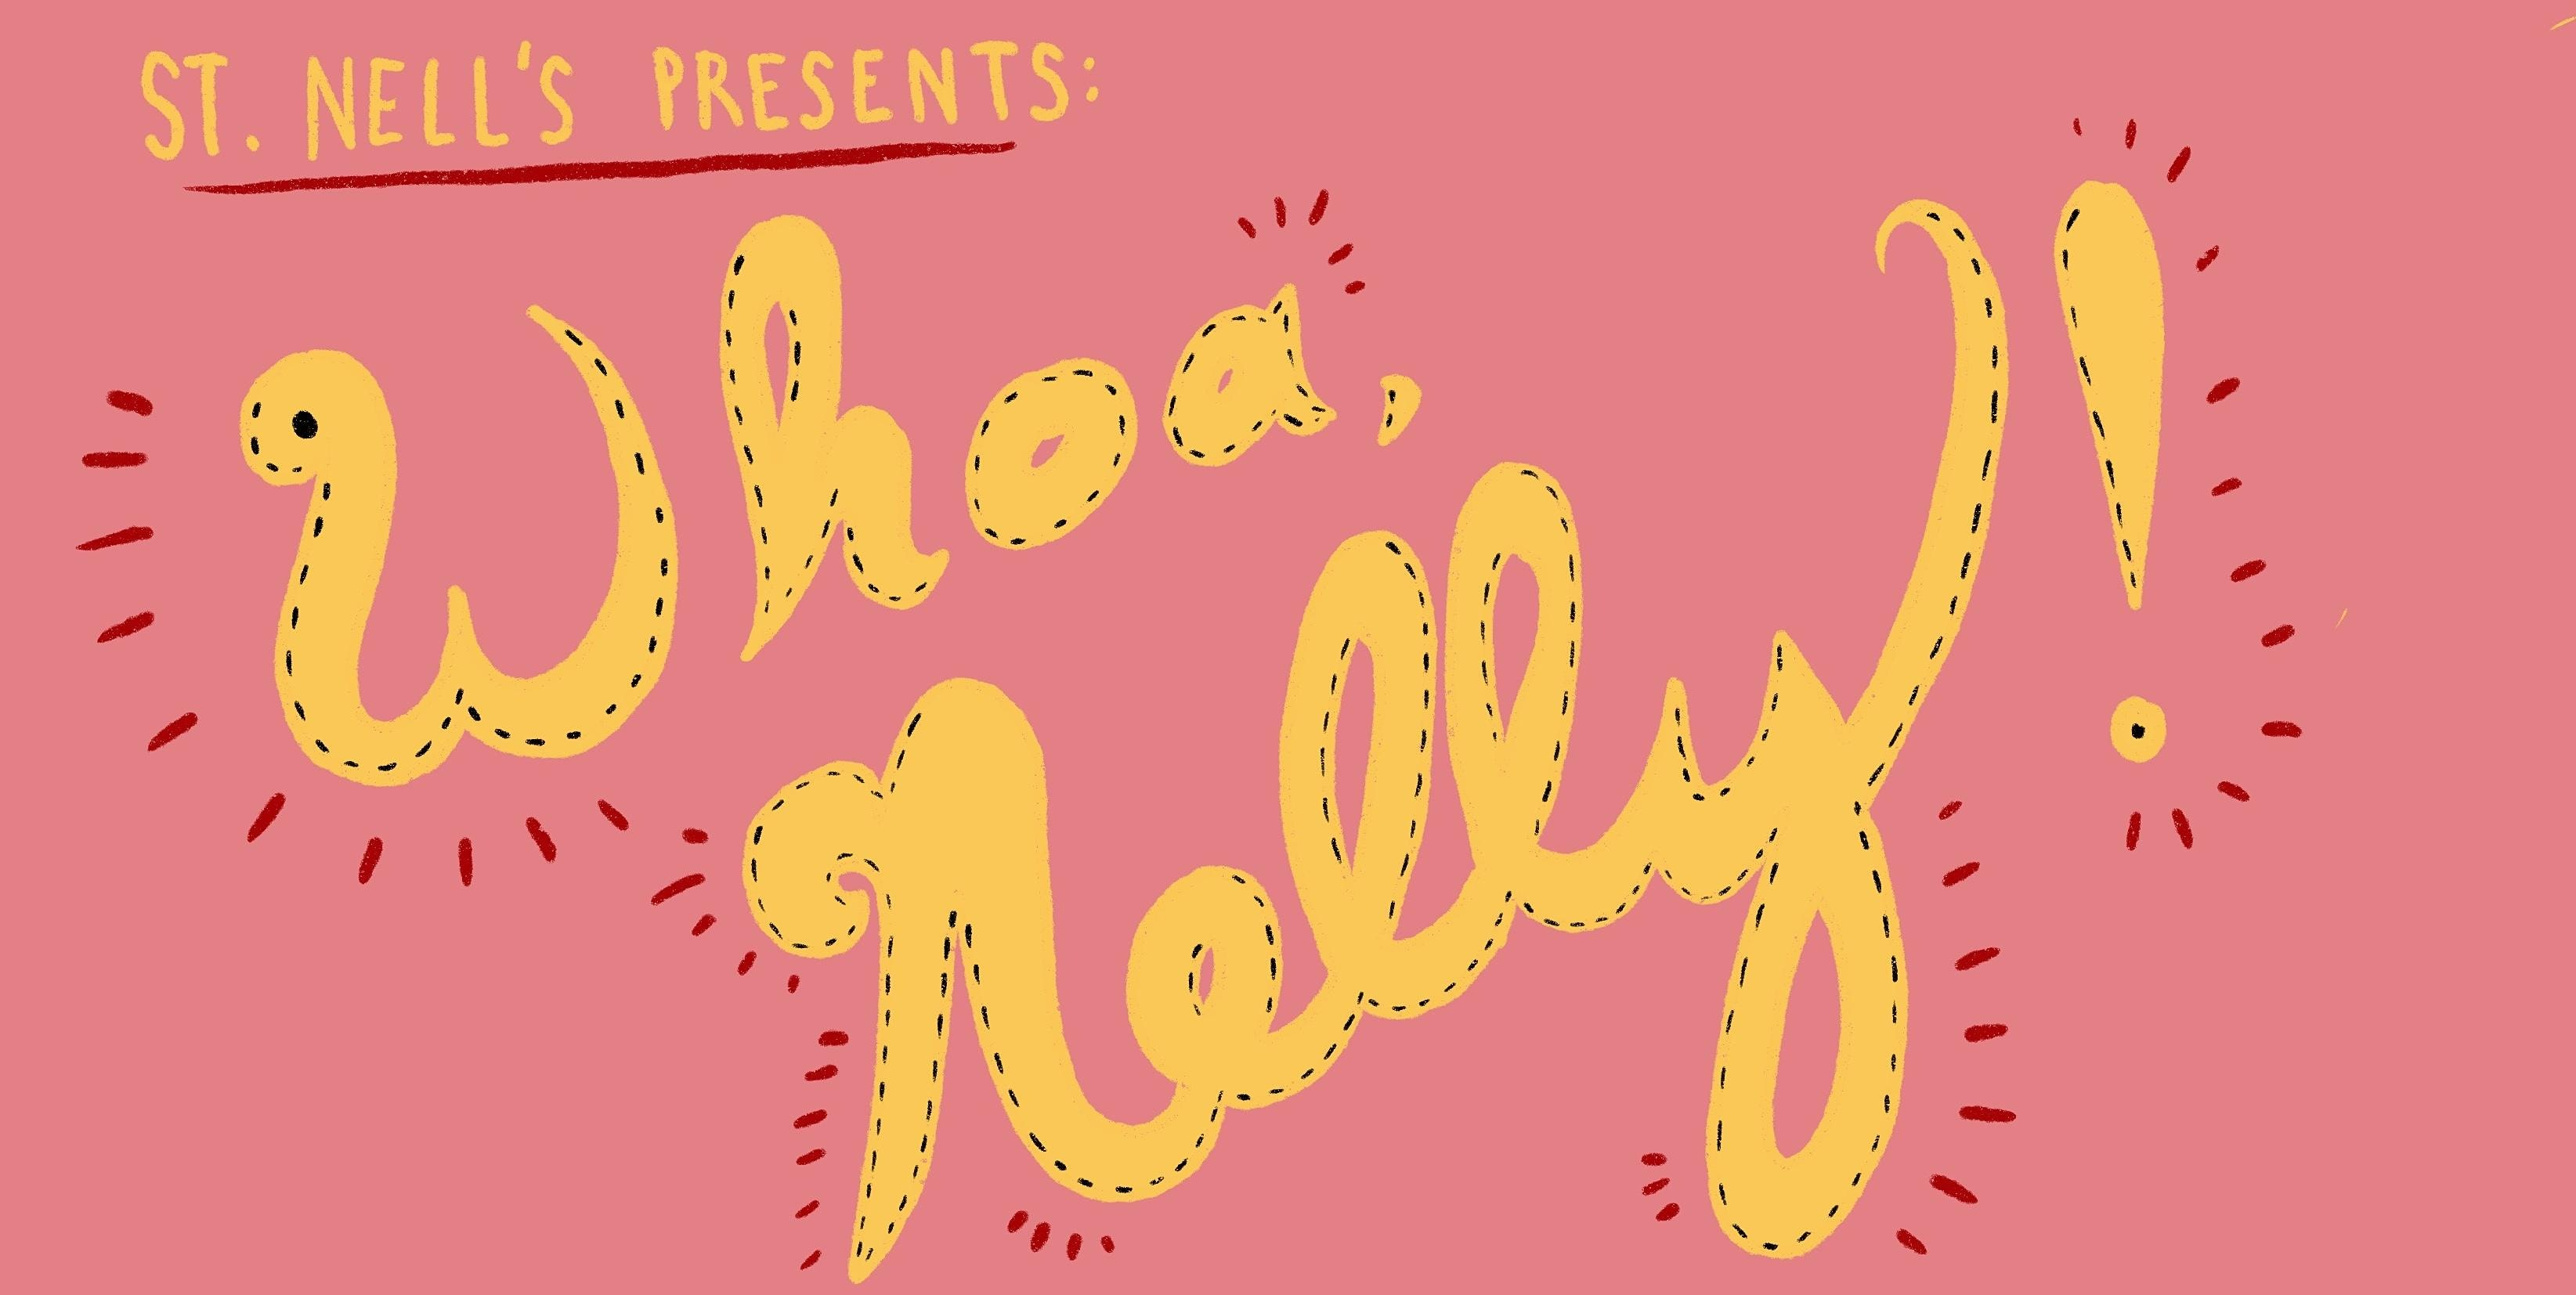 Whoa Nelly! A Non-Stop Comedy Variety Show